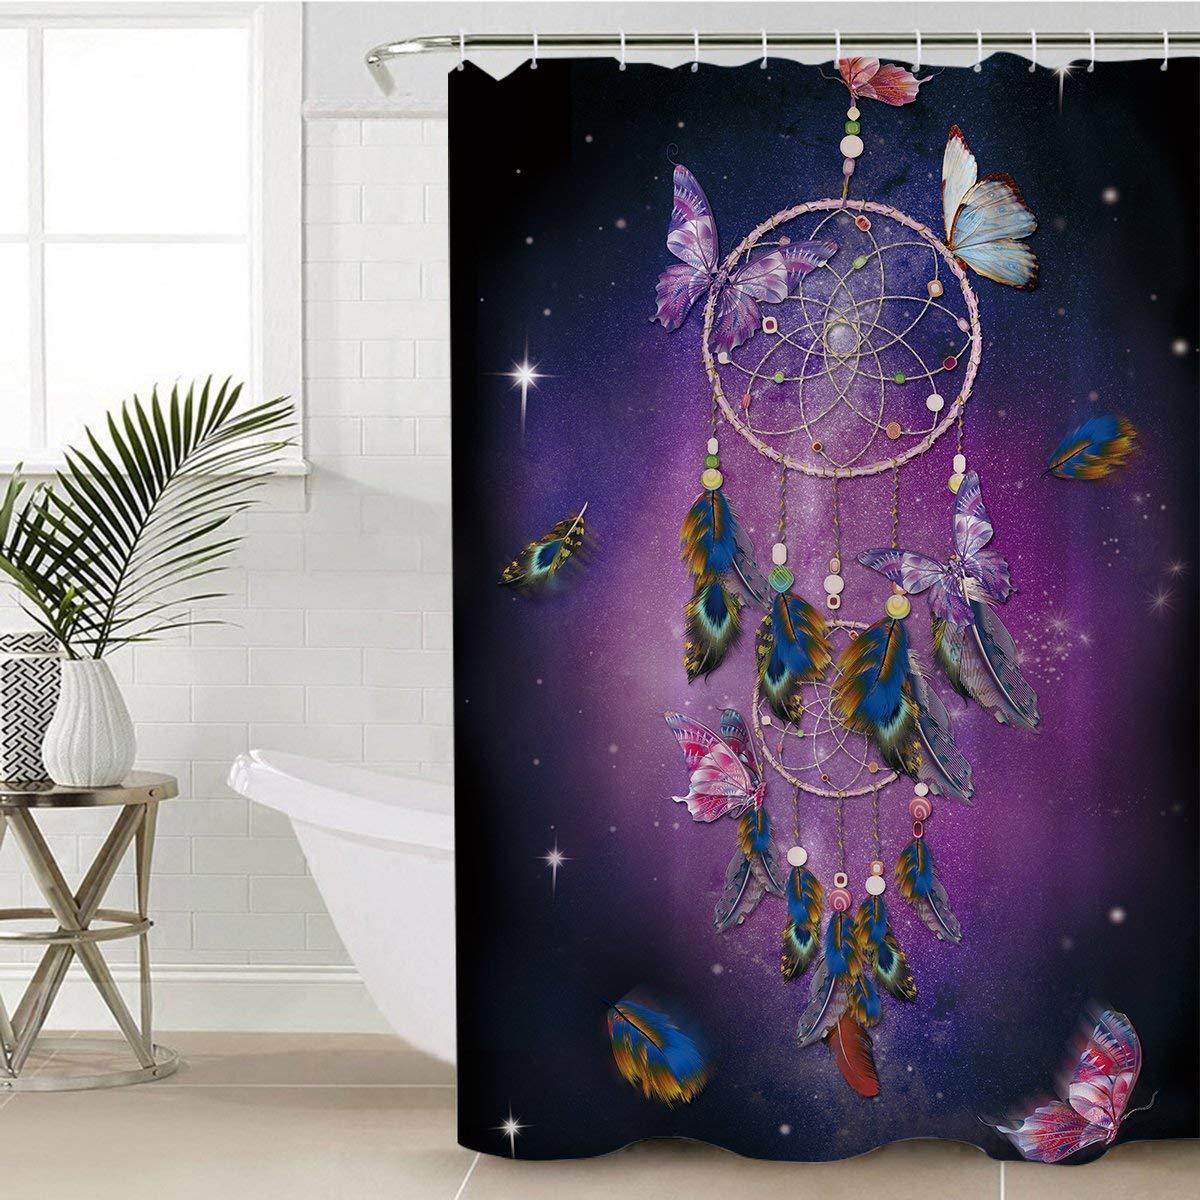 "Sleepwish Butterfly Shower Curtains Creative Bath Shower Curtain Dream Catcher Women Waterproof Mold Mildew Resistant Fabric Shower Curtain (Purple, 72"" W x 72"" H)"